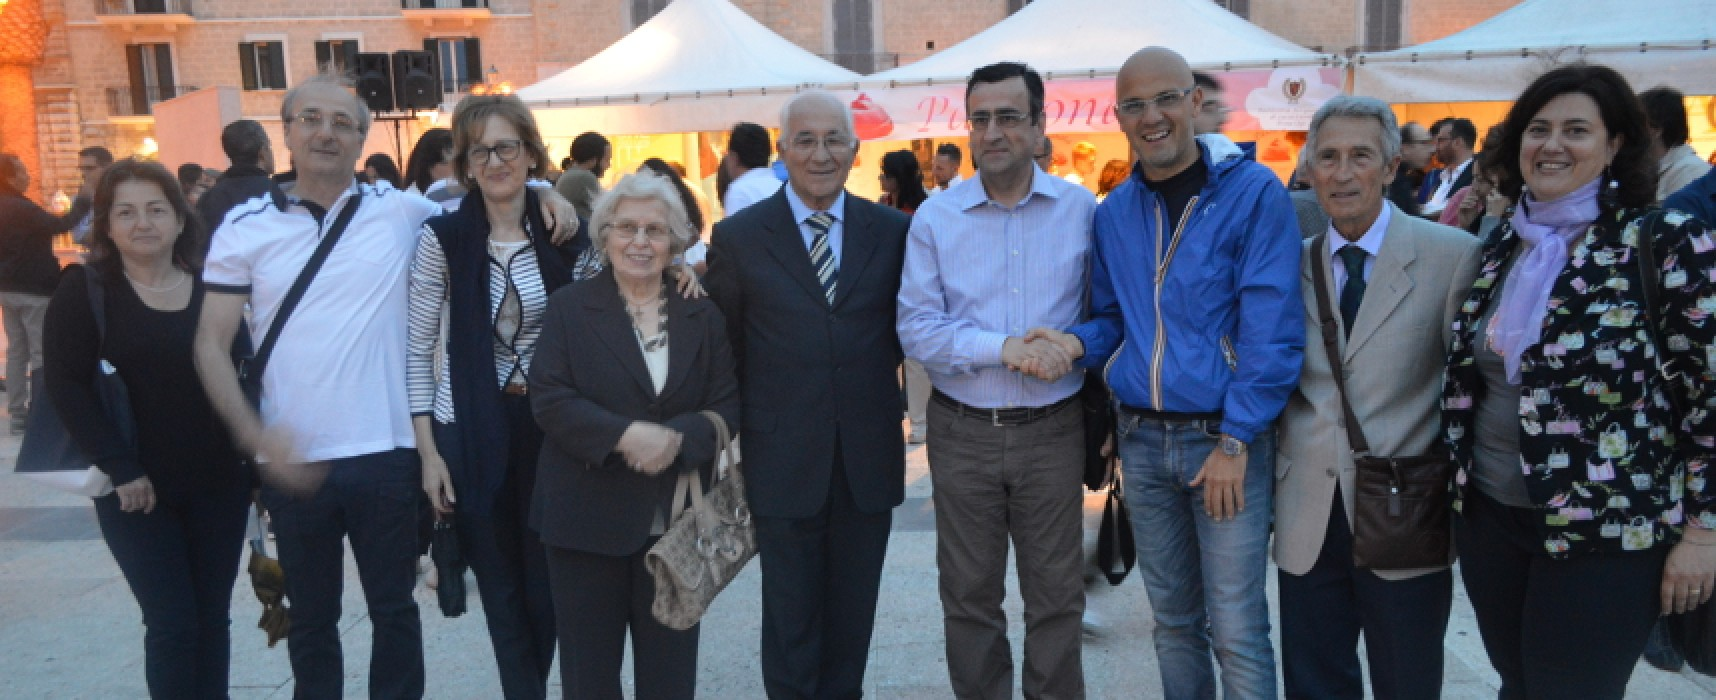 """Aspettando… Puglia Tipica 2014"", Bisceglie mette in mostra ciliegie e sospiri / FOTO"